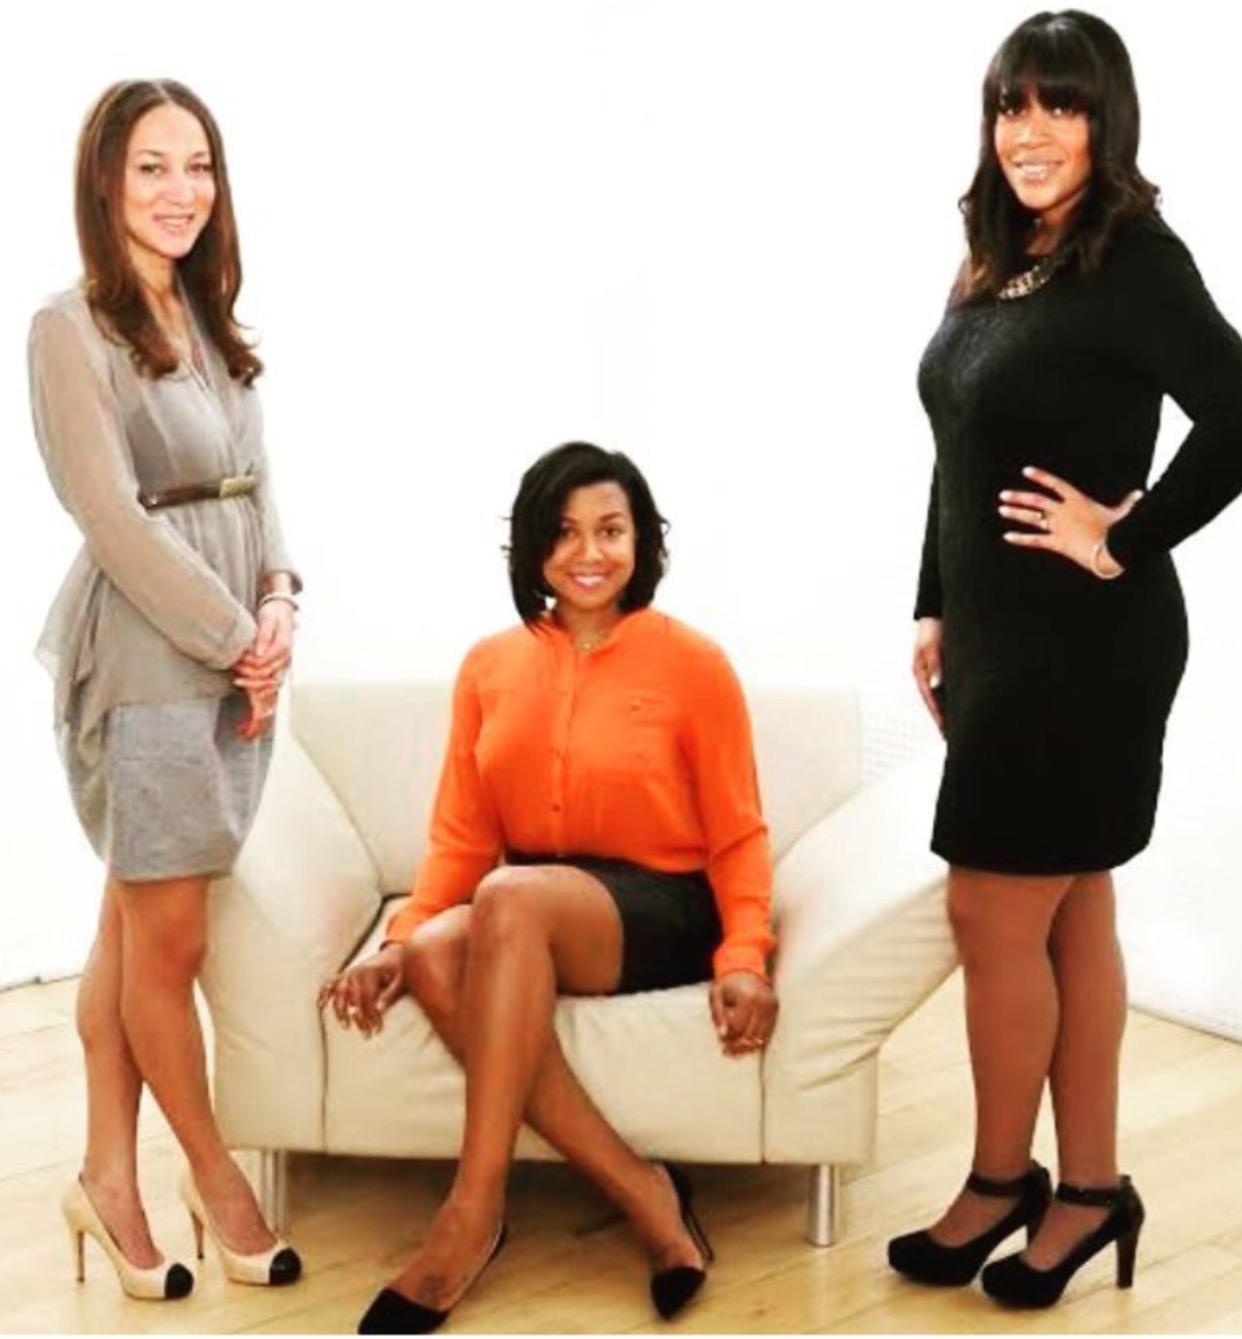 Keli Knight, Yondi Morris & Jessica Reddick/KMR Law Group